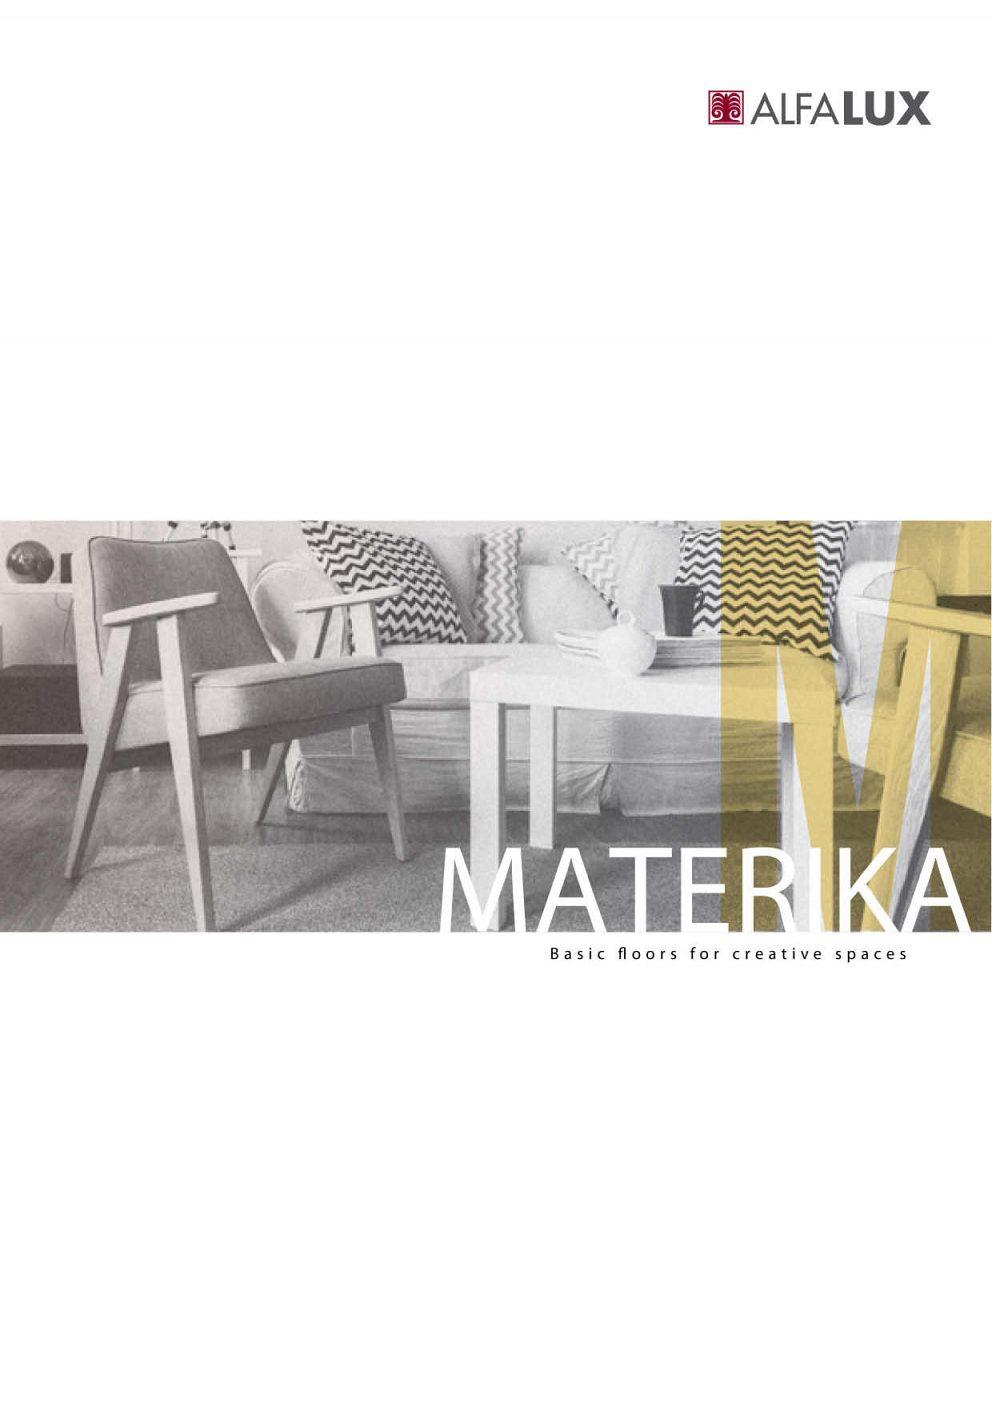 Alfalux - Materika